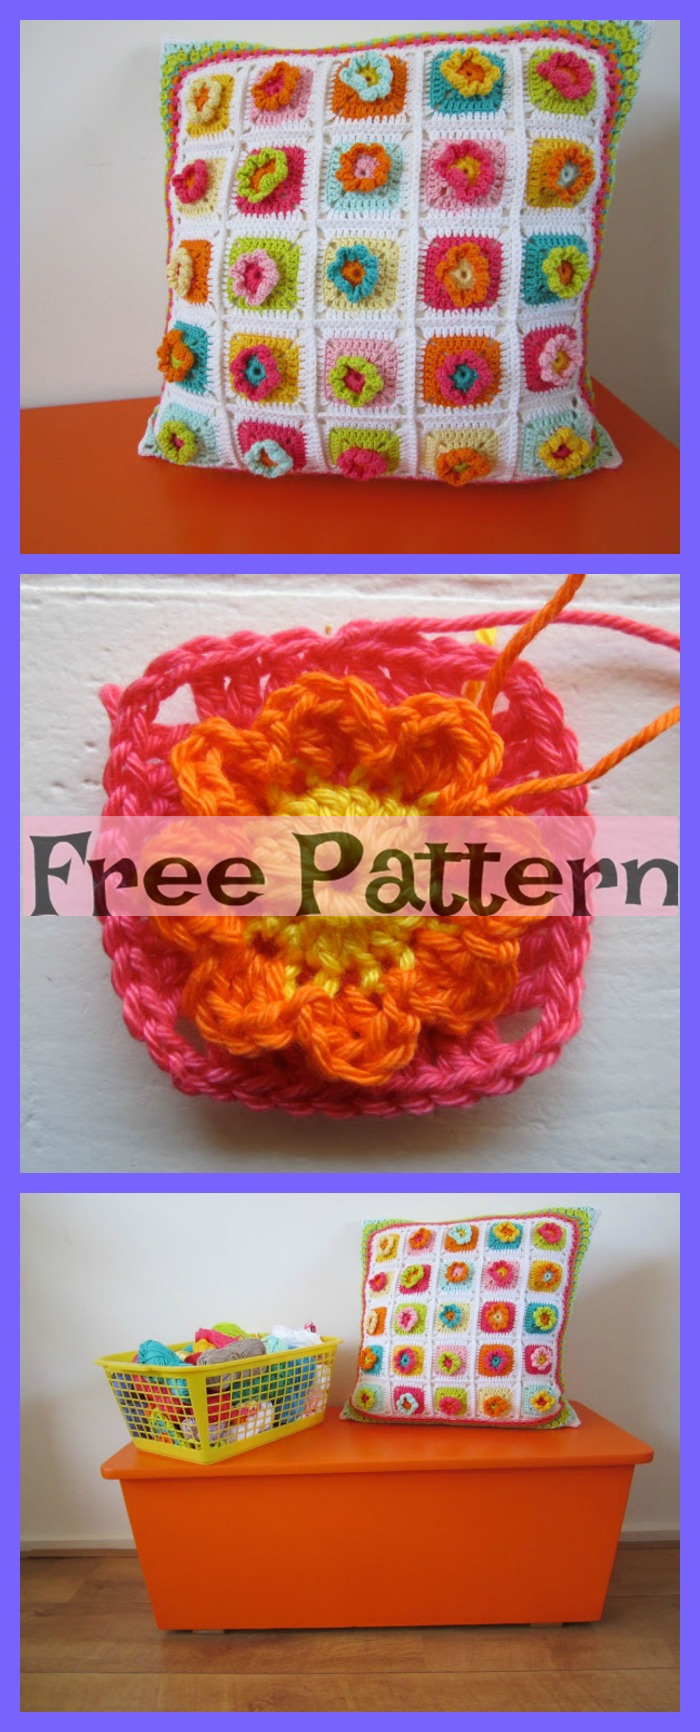 Crochet Rainbow Pillows - Free Patterns